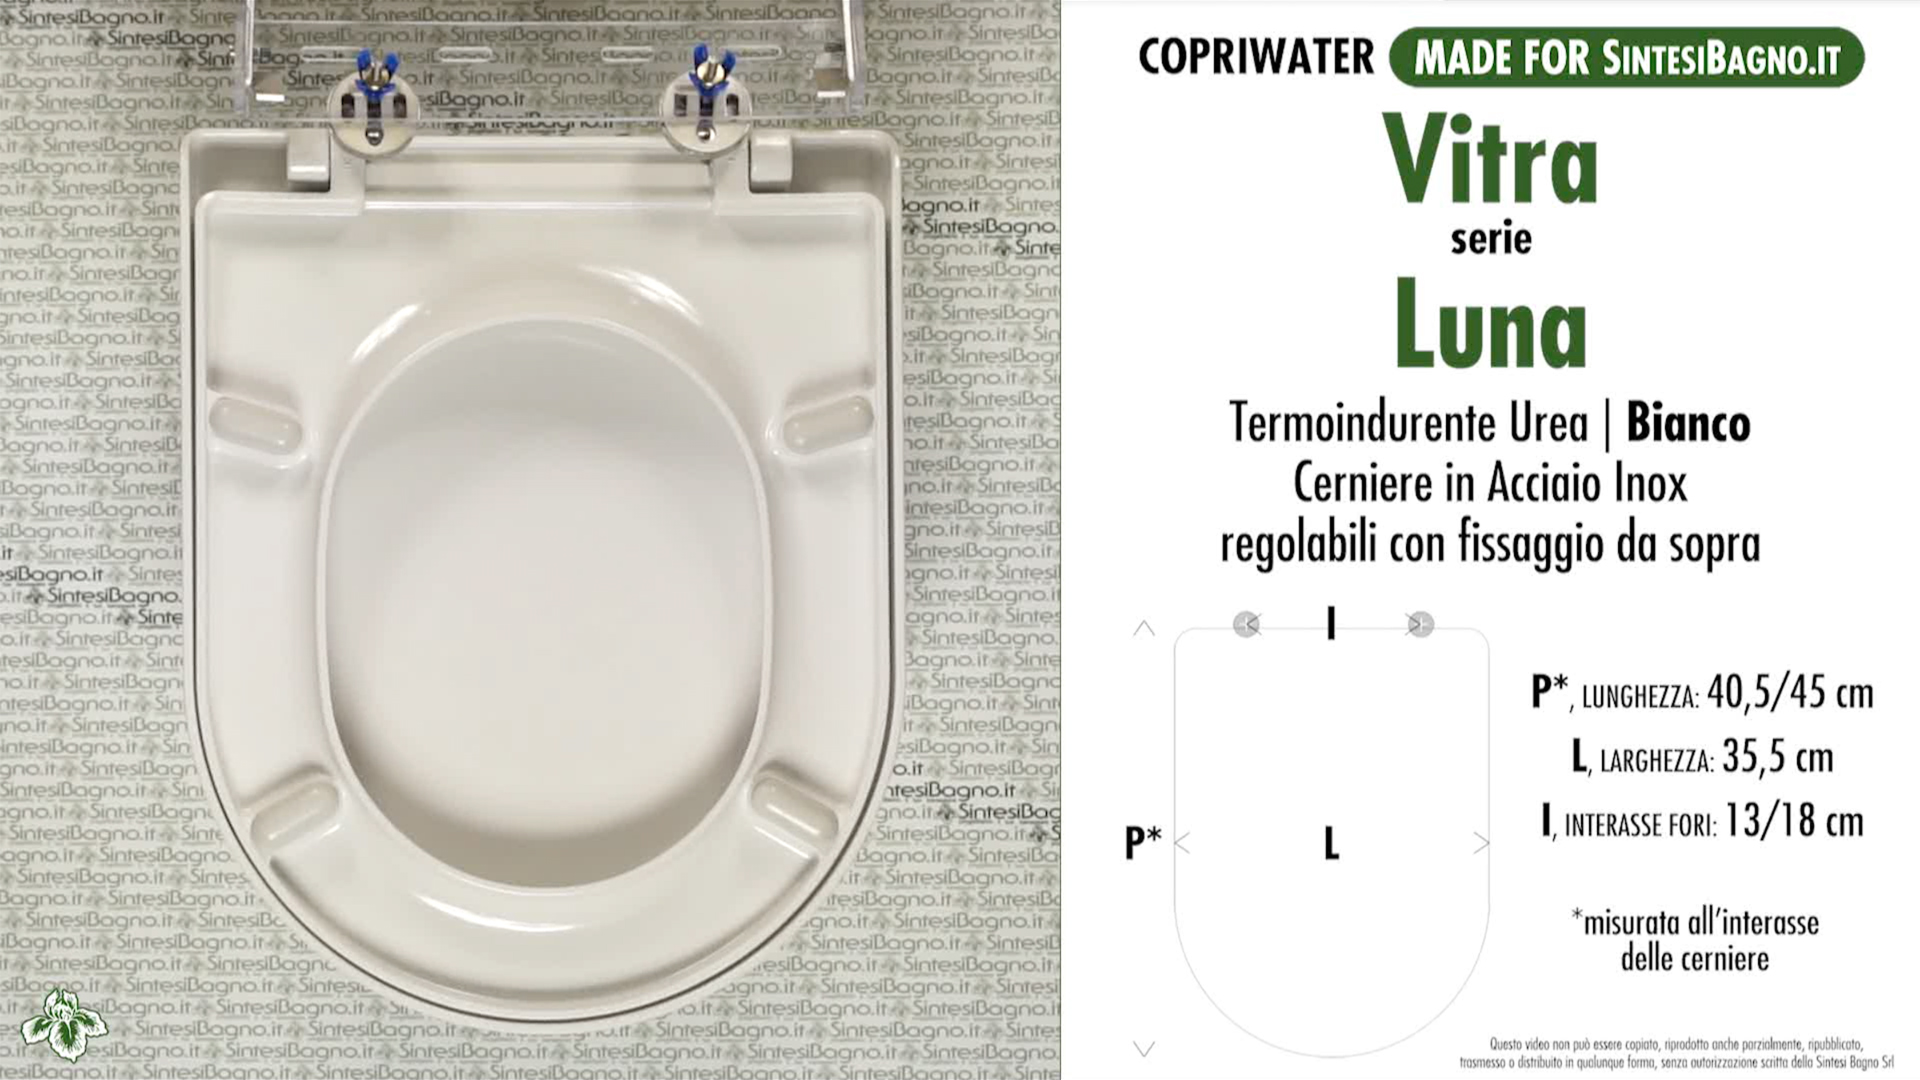 SCHEDA TECNICA MISURE copriwater VITRA LUNA